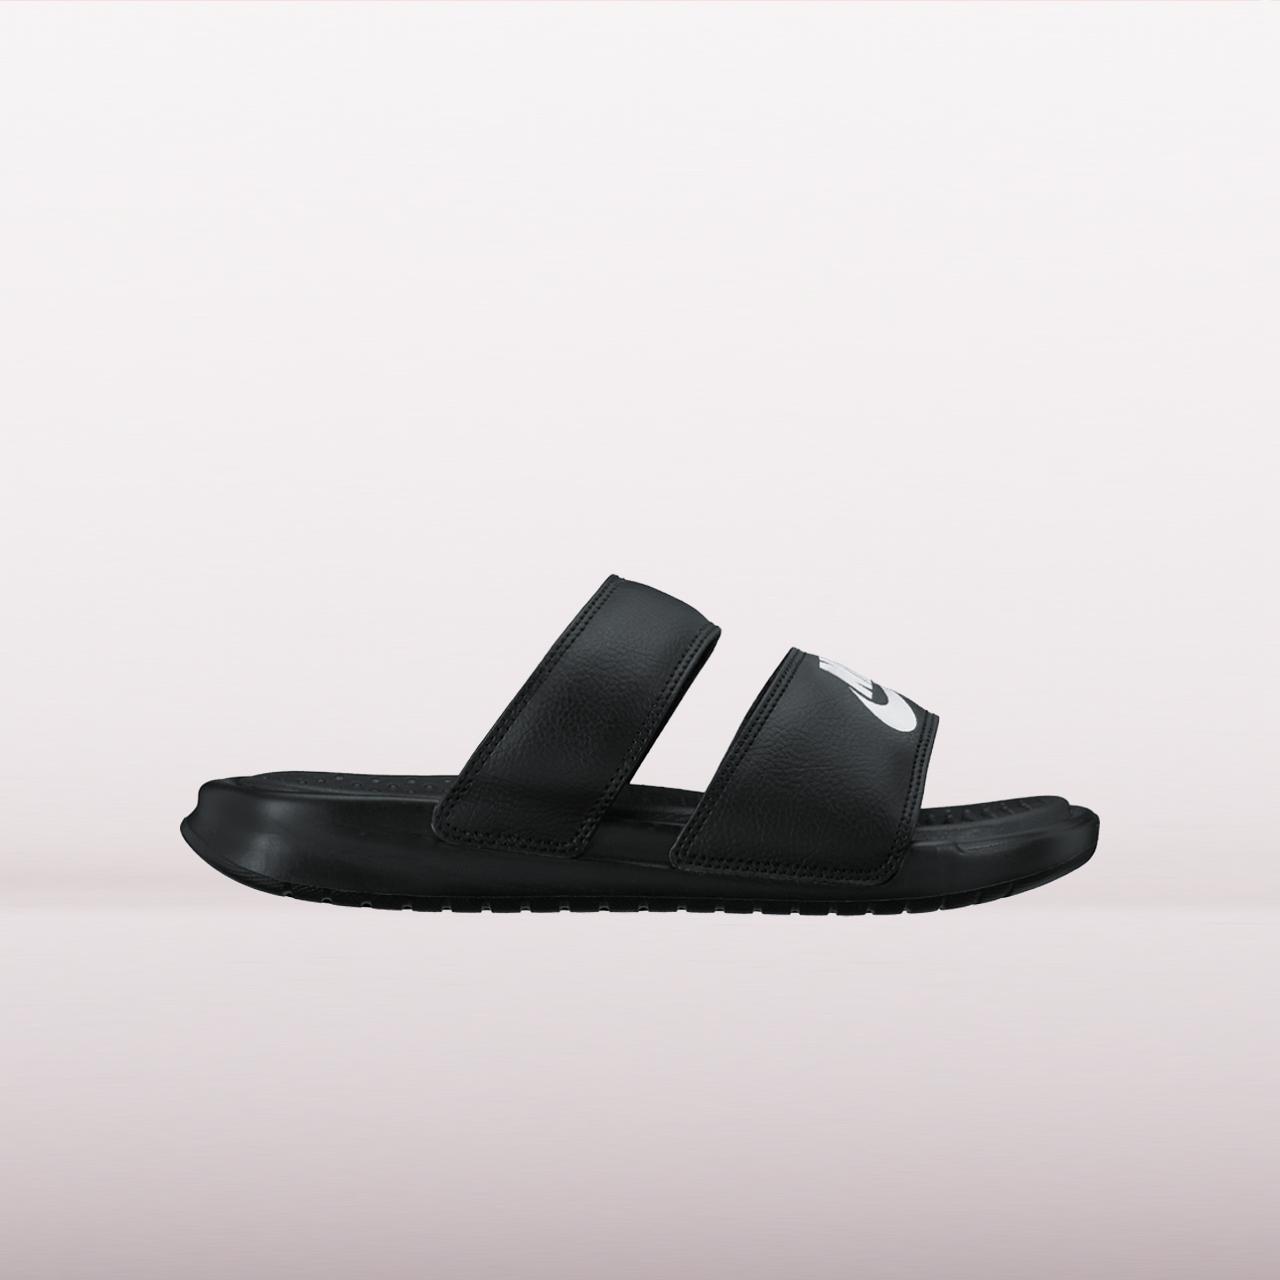 Slipper Nike Slide Ultra Benassi Dames Duo JF3T1clK